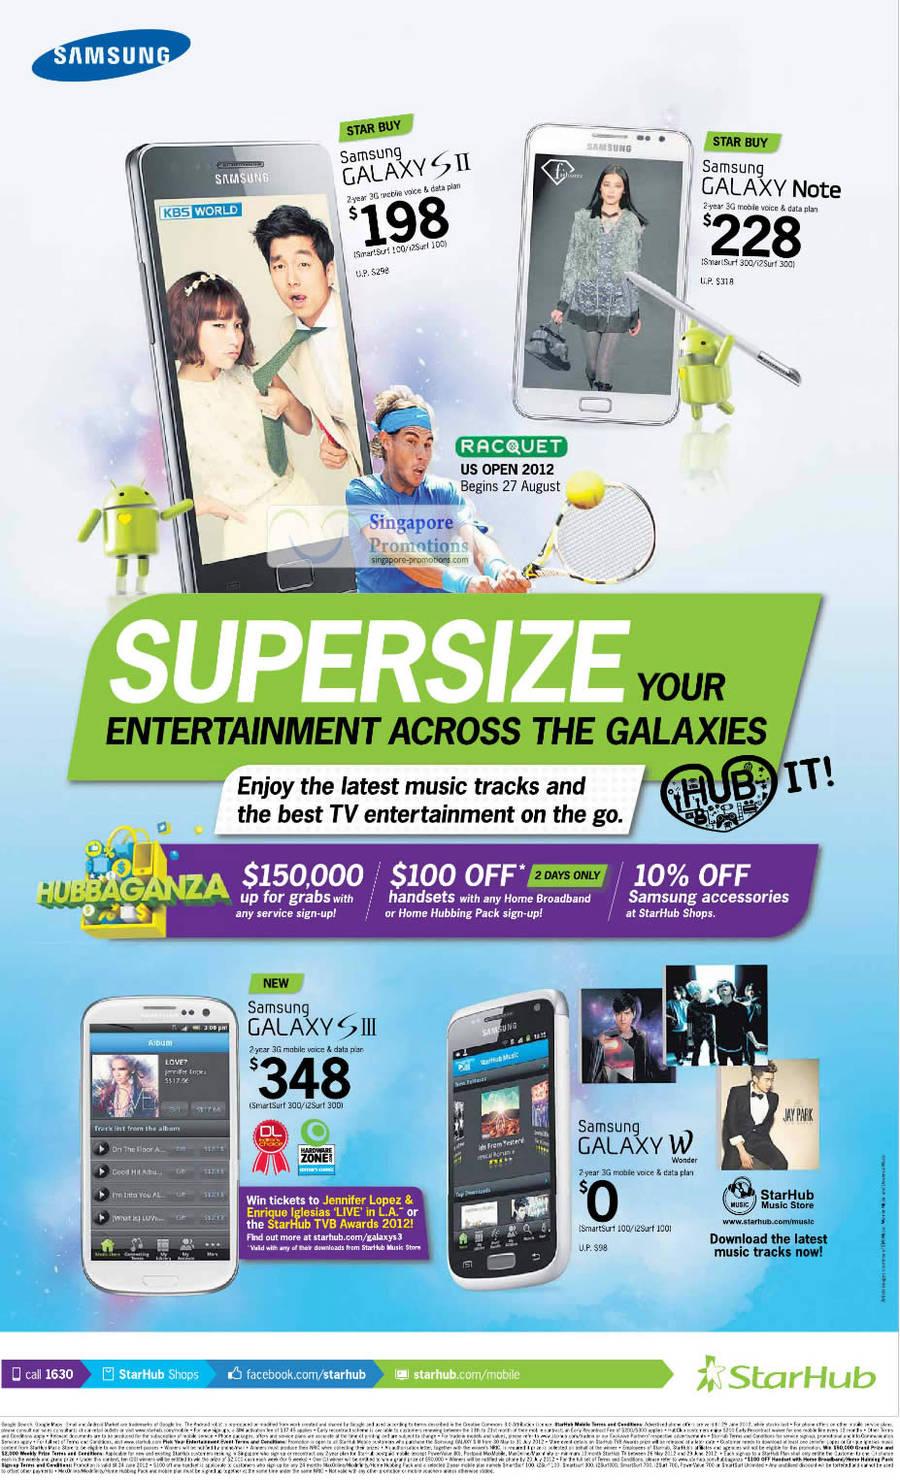 Samsung Galaxy S II, Samsung Galaxy Note, Samsung Galaxy S III, Samsung Galaxy W